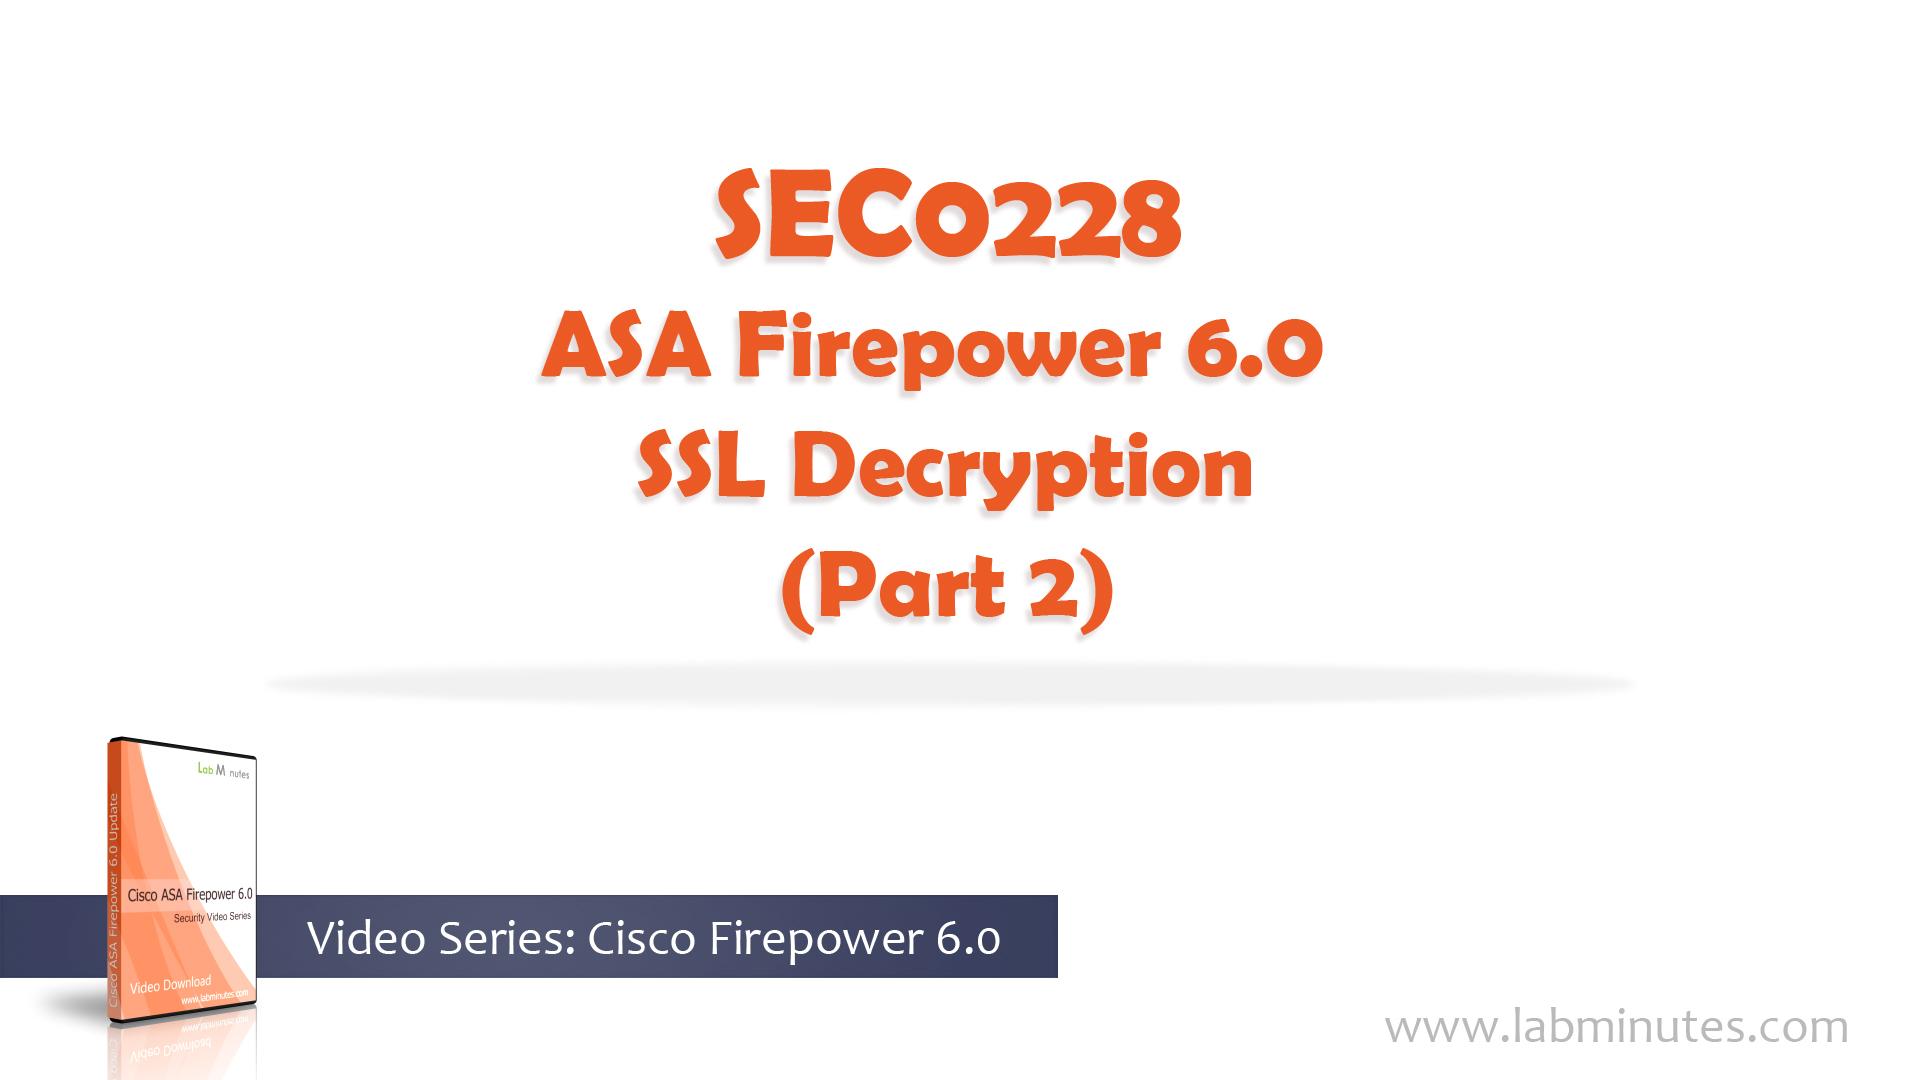 How to Configure ASA Firepower 6 0 SSL Decryption (Part 2)